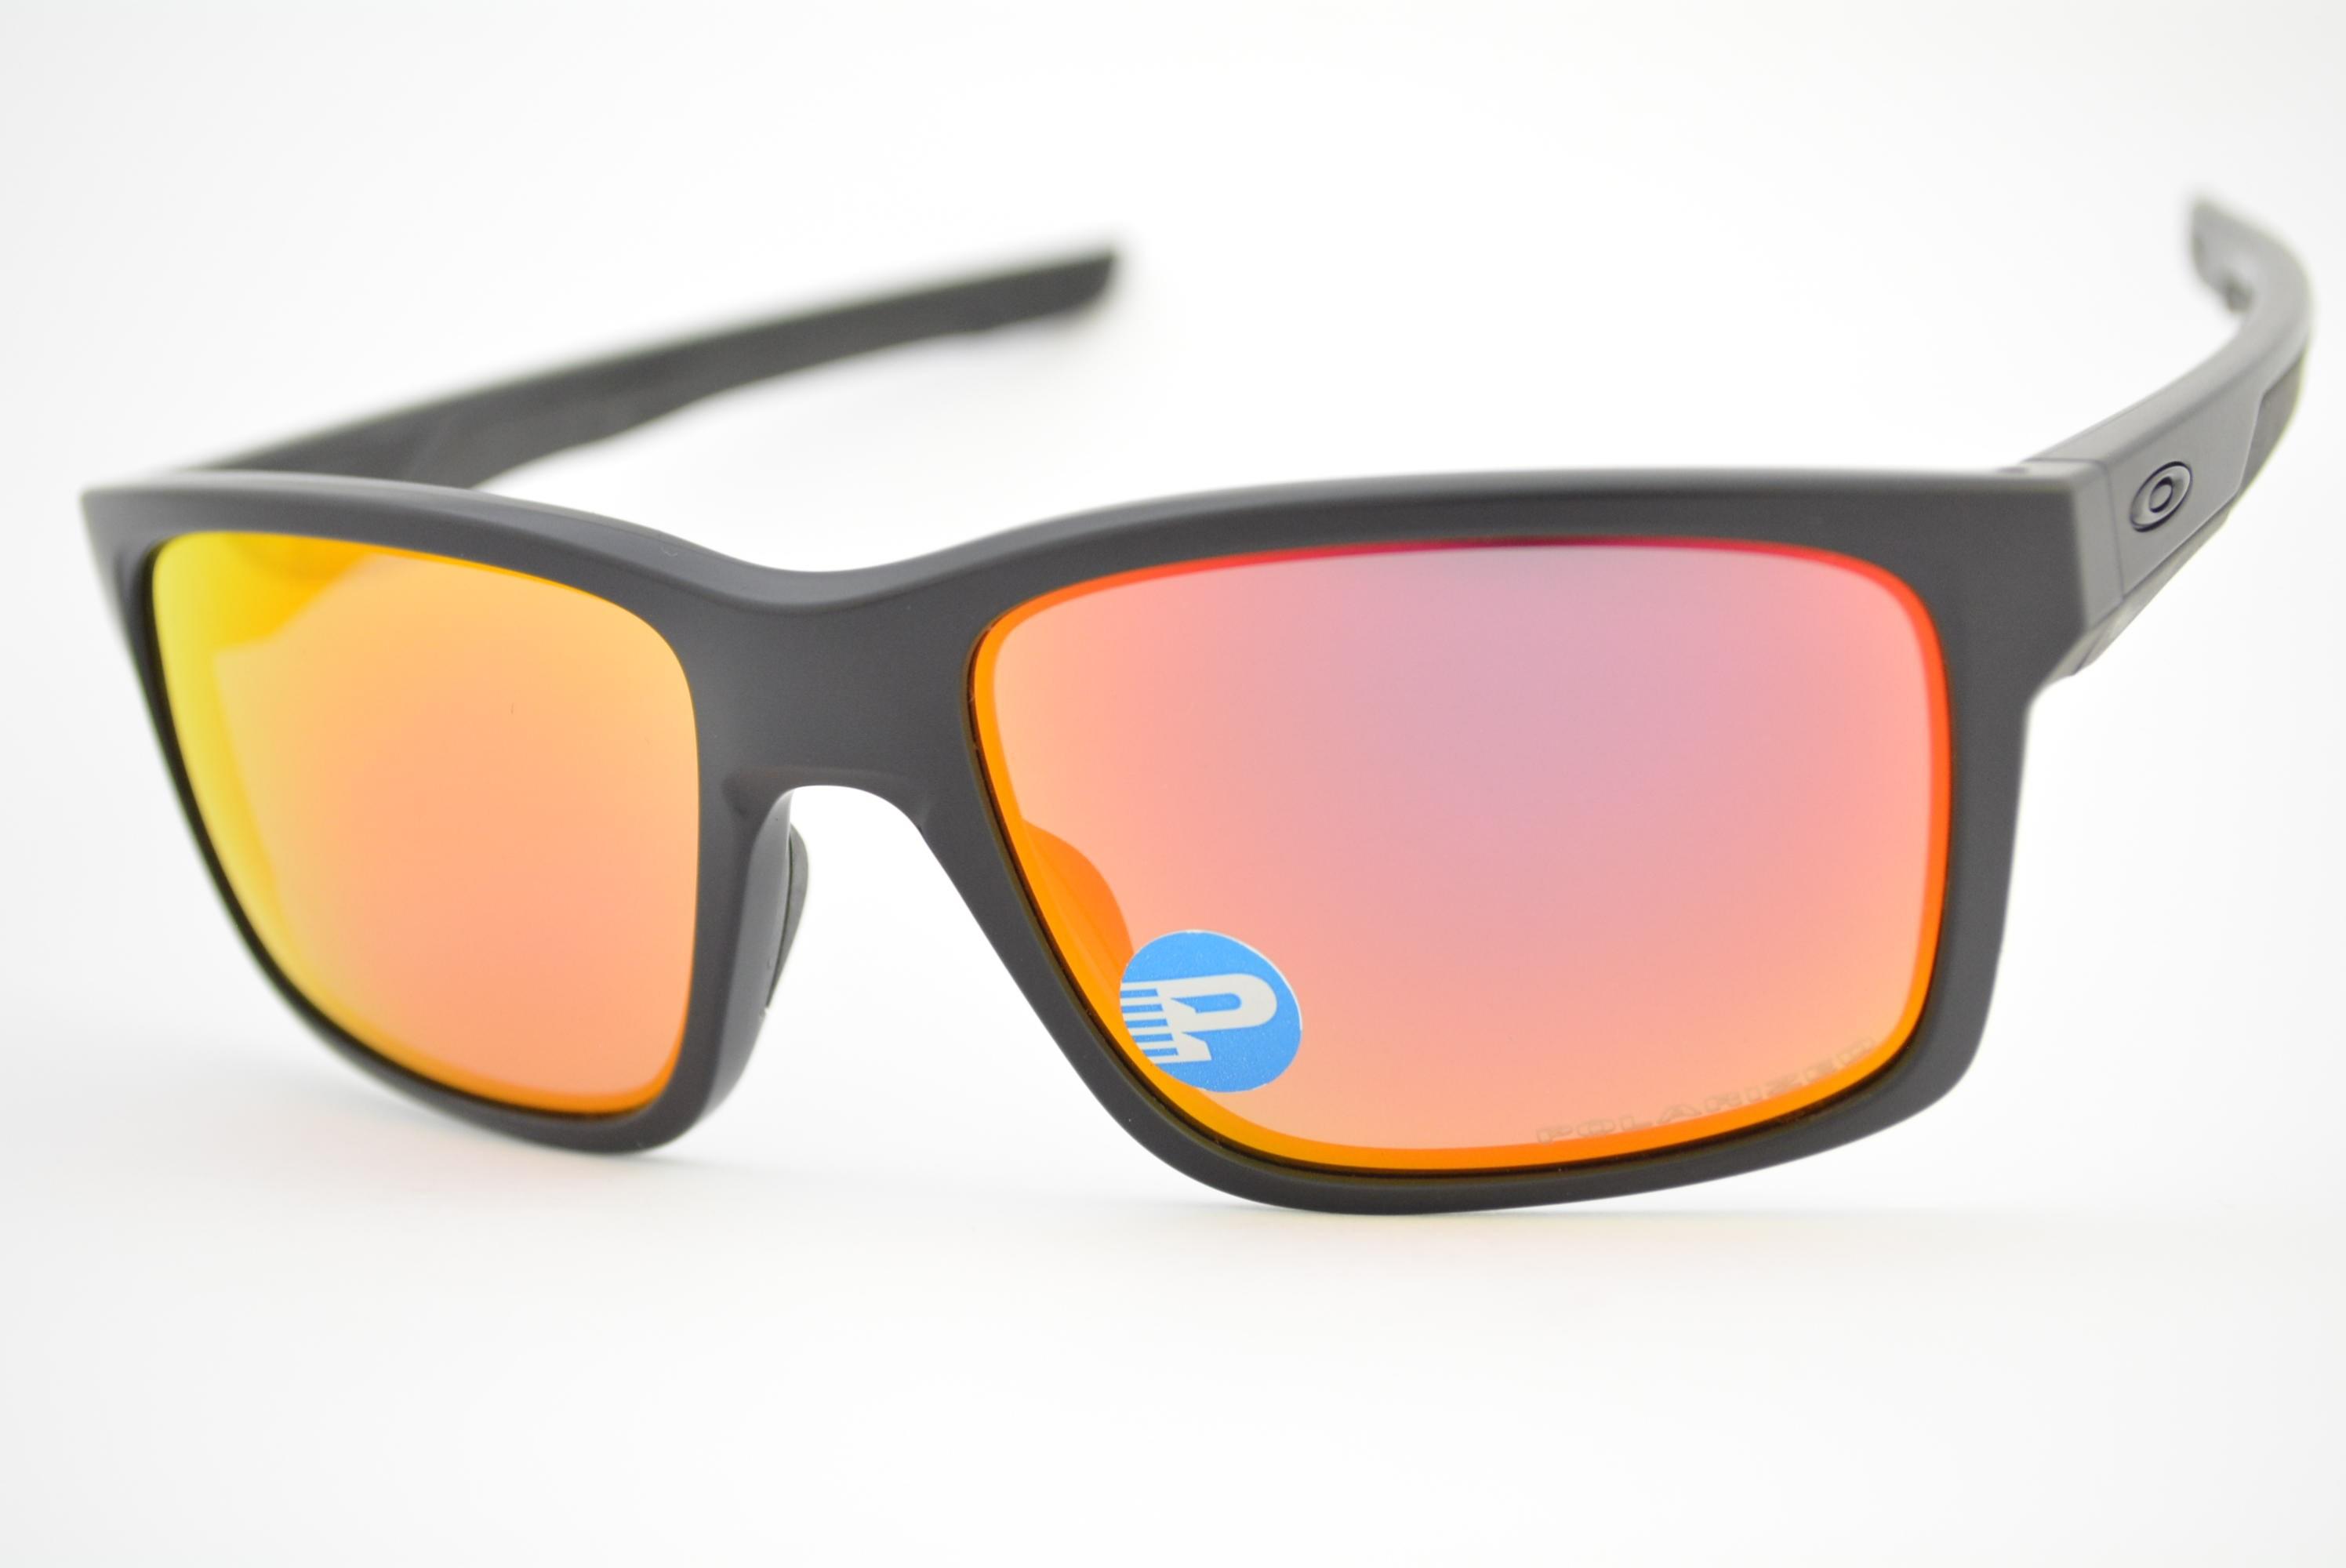 b13223f3e3ca6 óculos de sol Oakley mod Mainlink matte black w ruby iridium polarized  009264-07